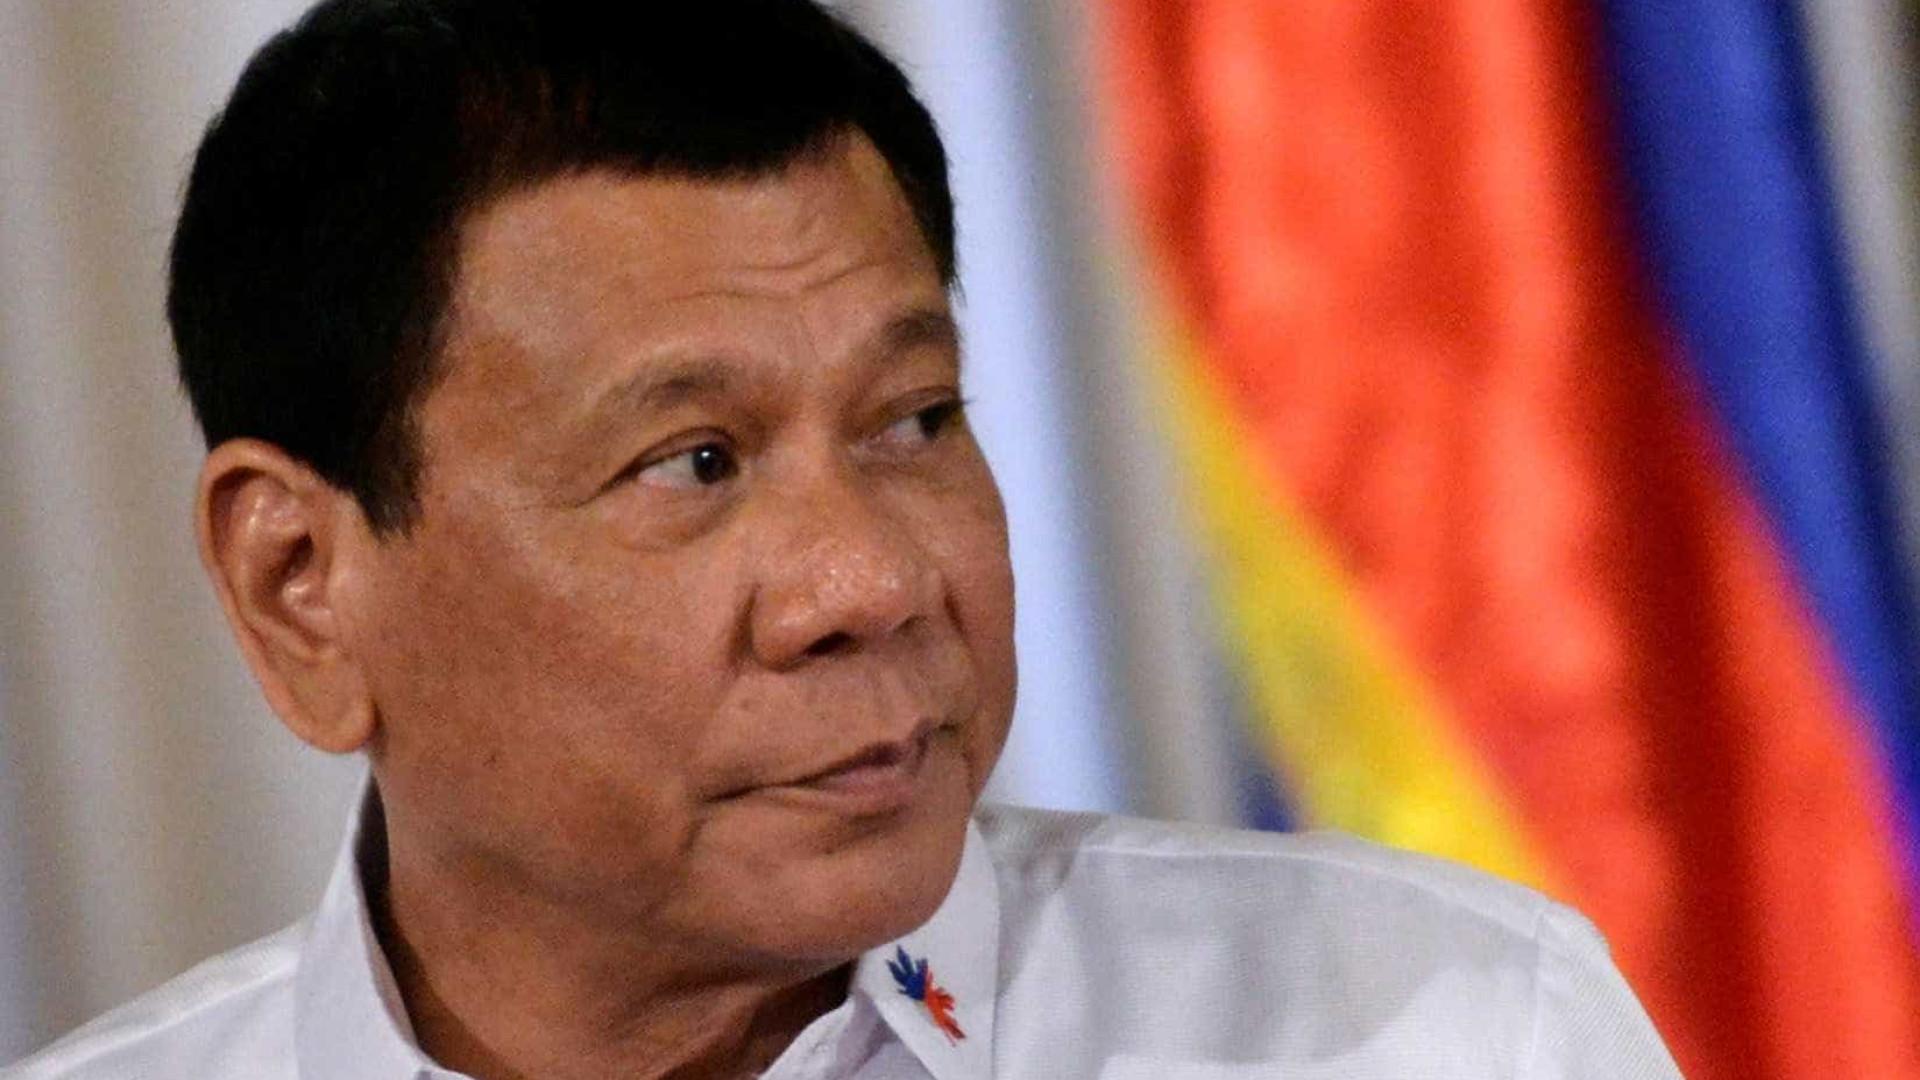 Presidente filipino quer armar civis para combater extremistas